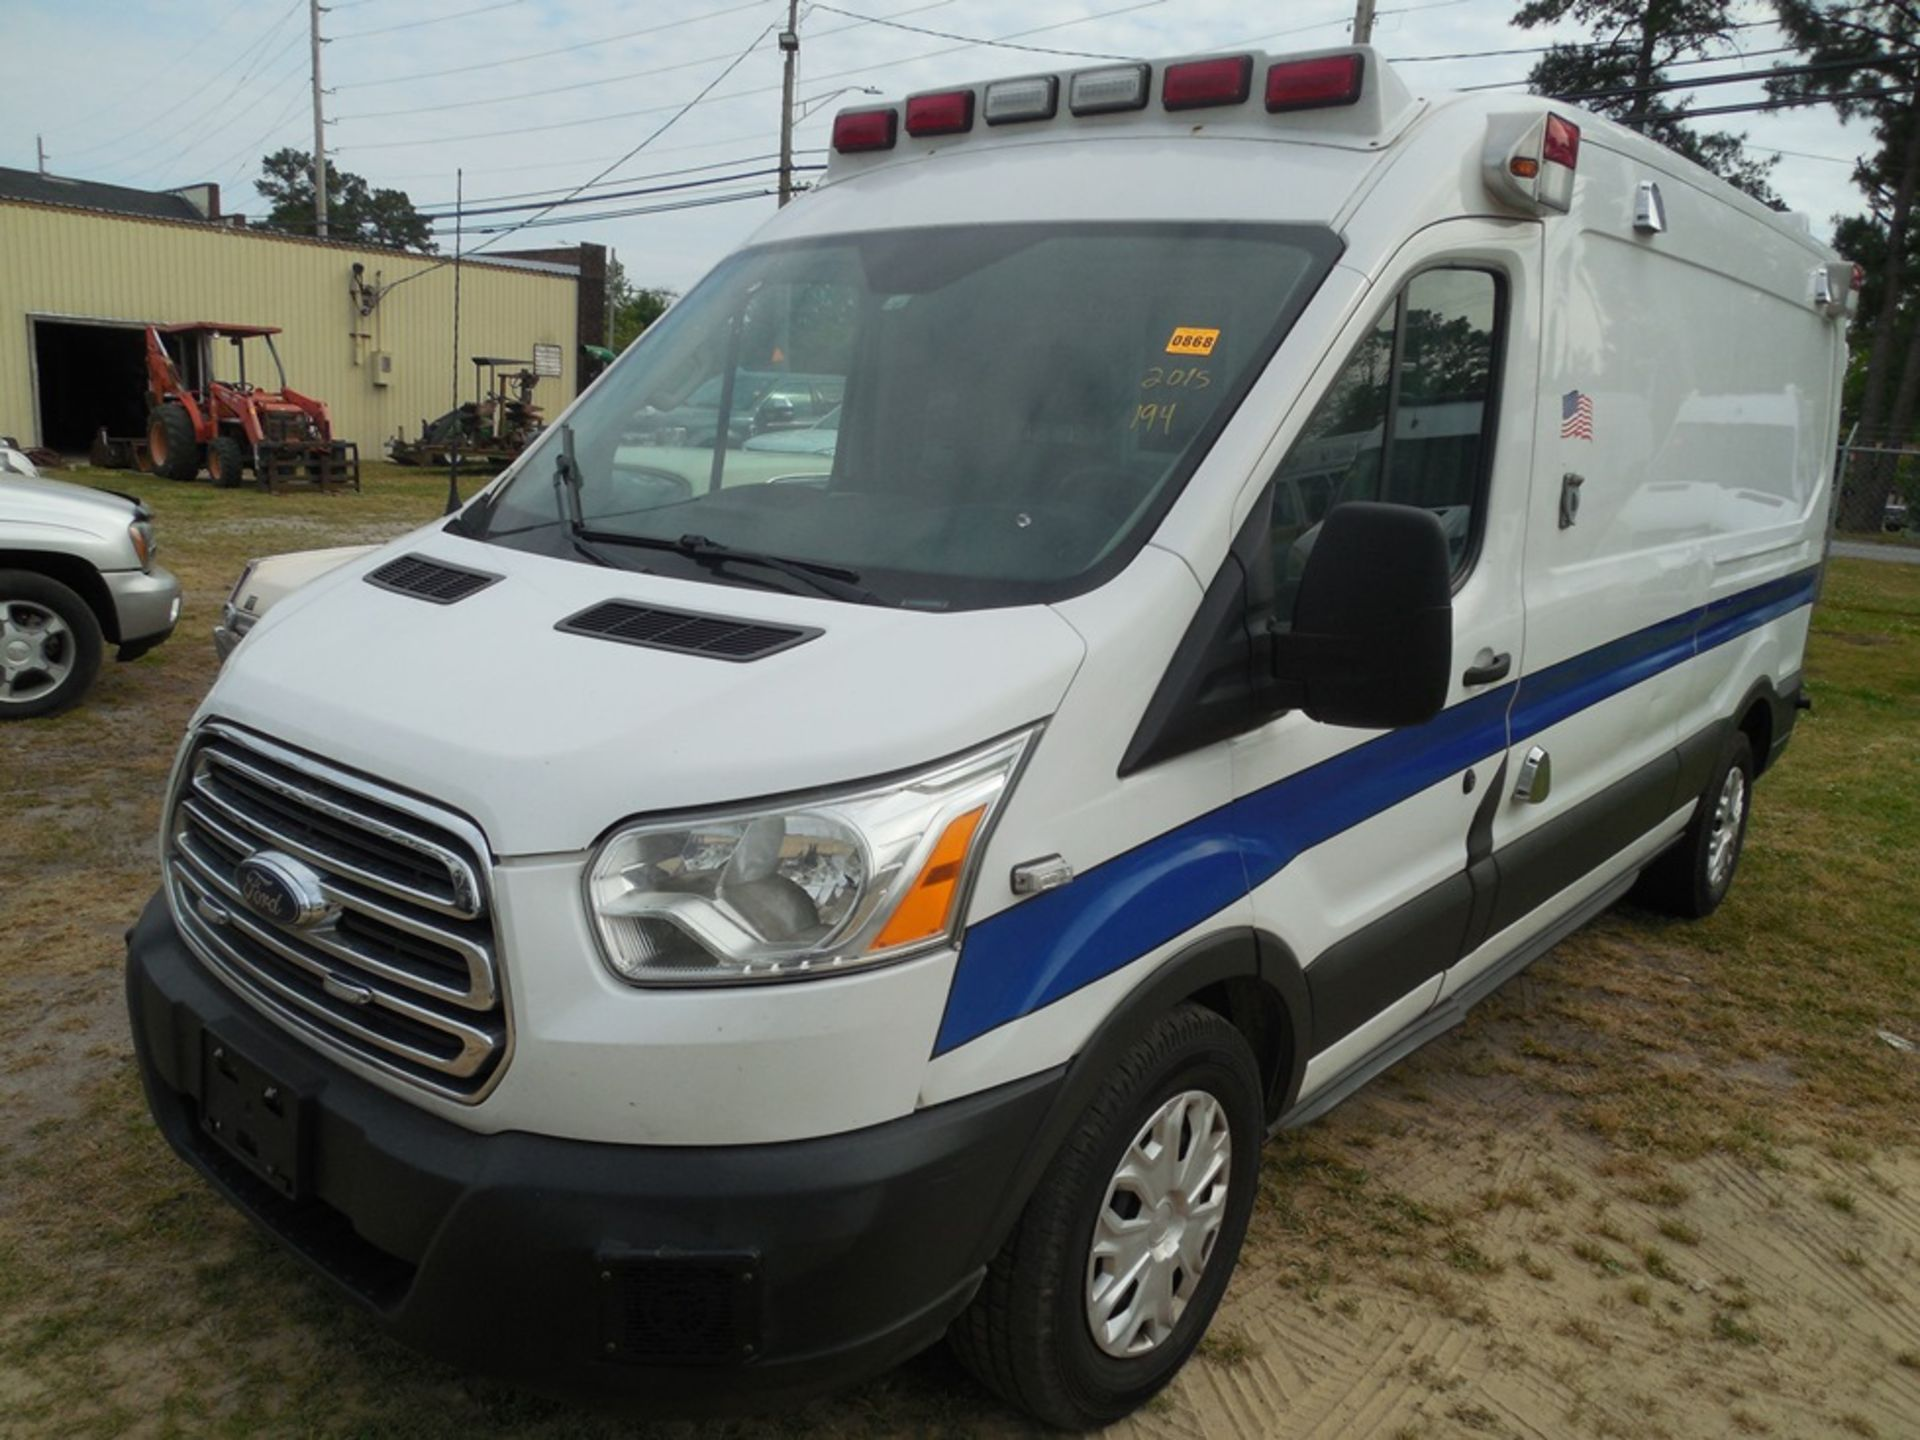 2015 Ford Tansit 250 dsl ambulance 194,312 miles vin# 1FDYR2CV5FKB33096 - Image 2 of 6